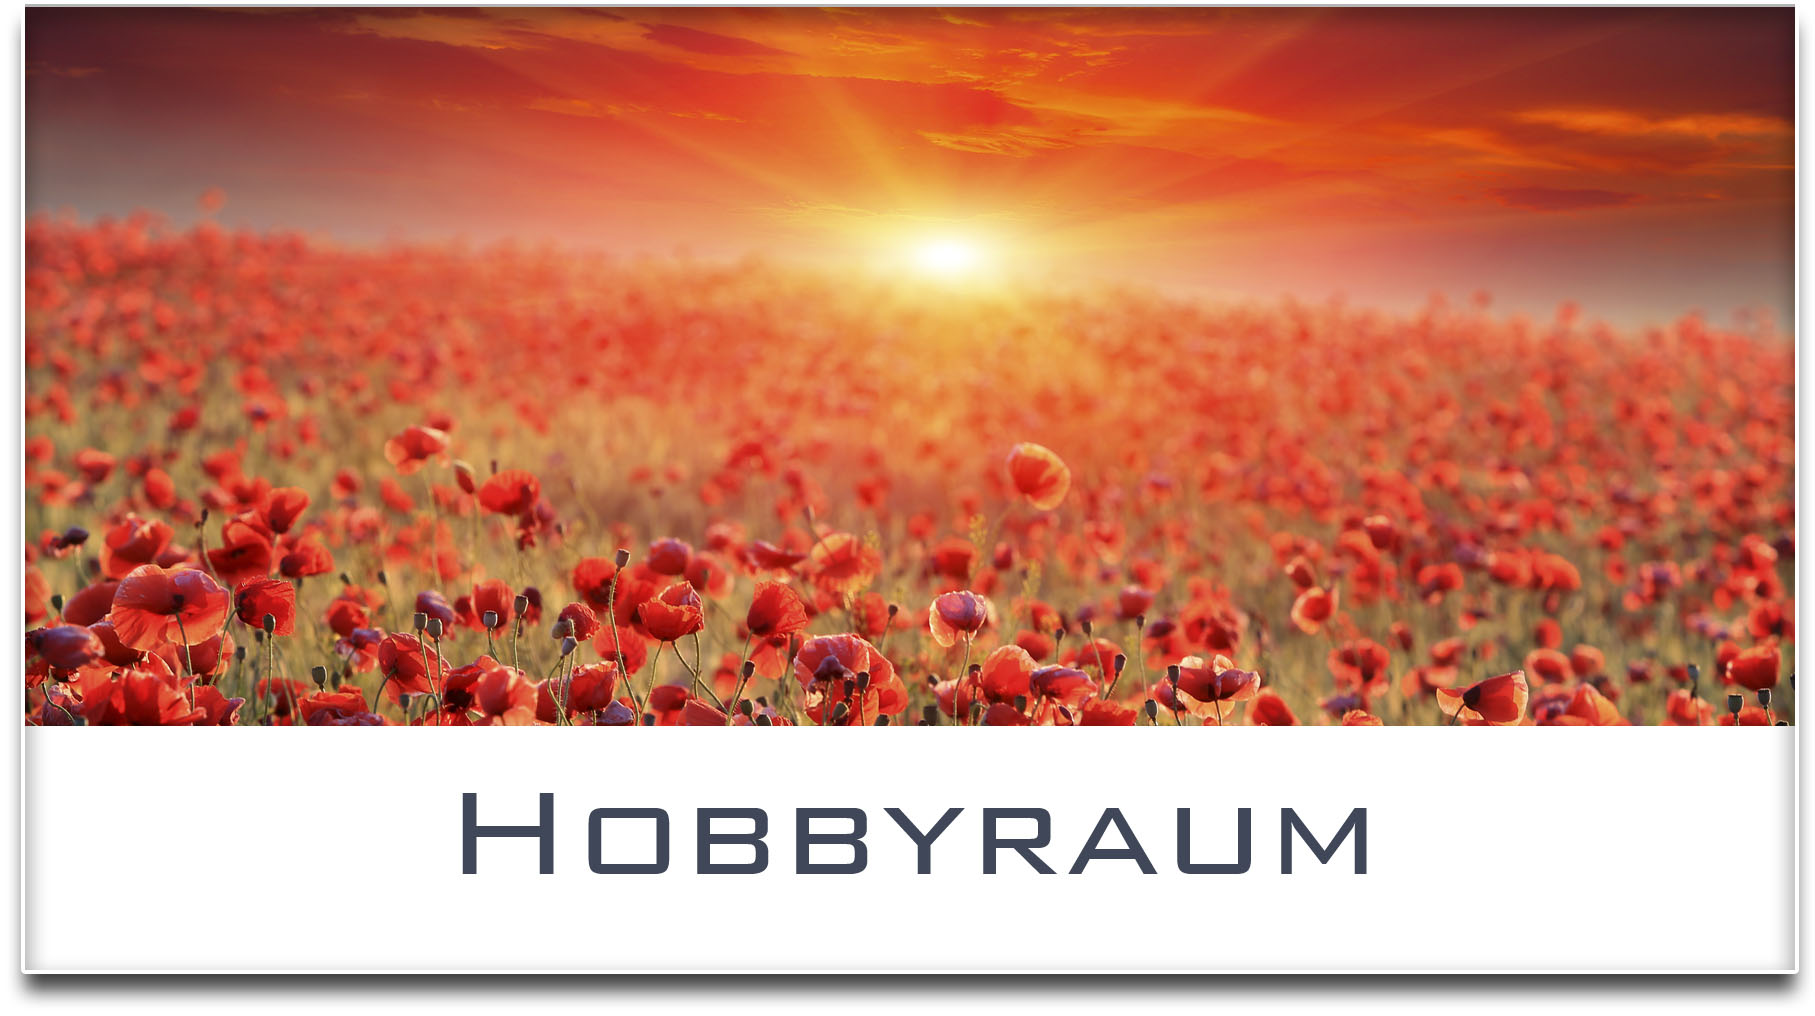 Türschild / Mohnfeld / Sonnenuntergang / Hobbyraum / Selbstklebend